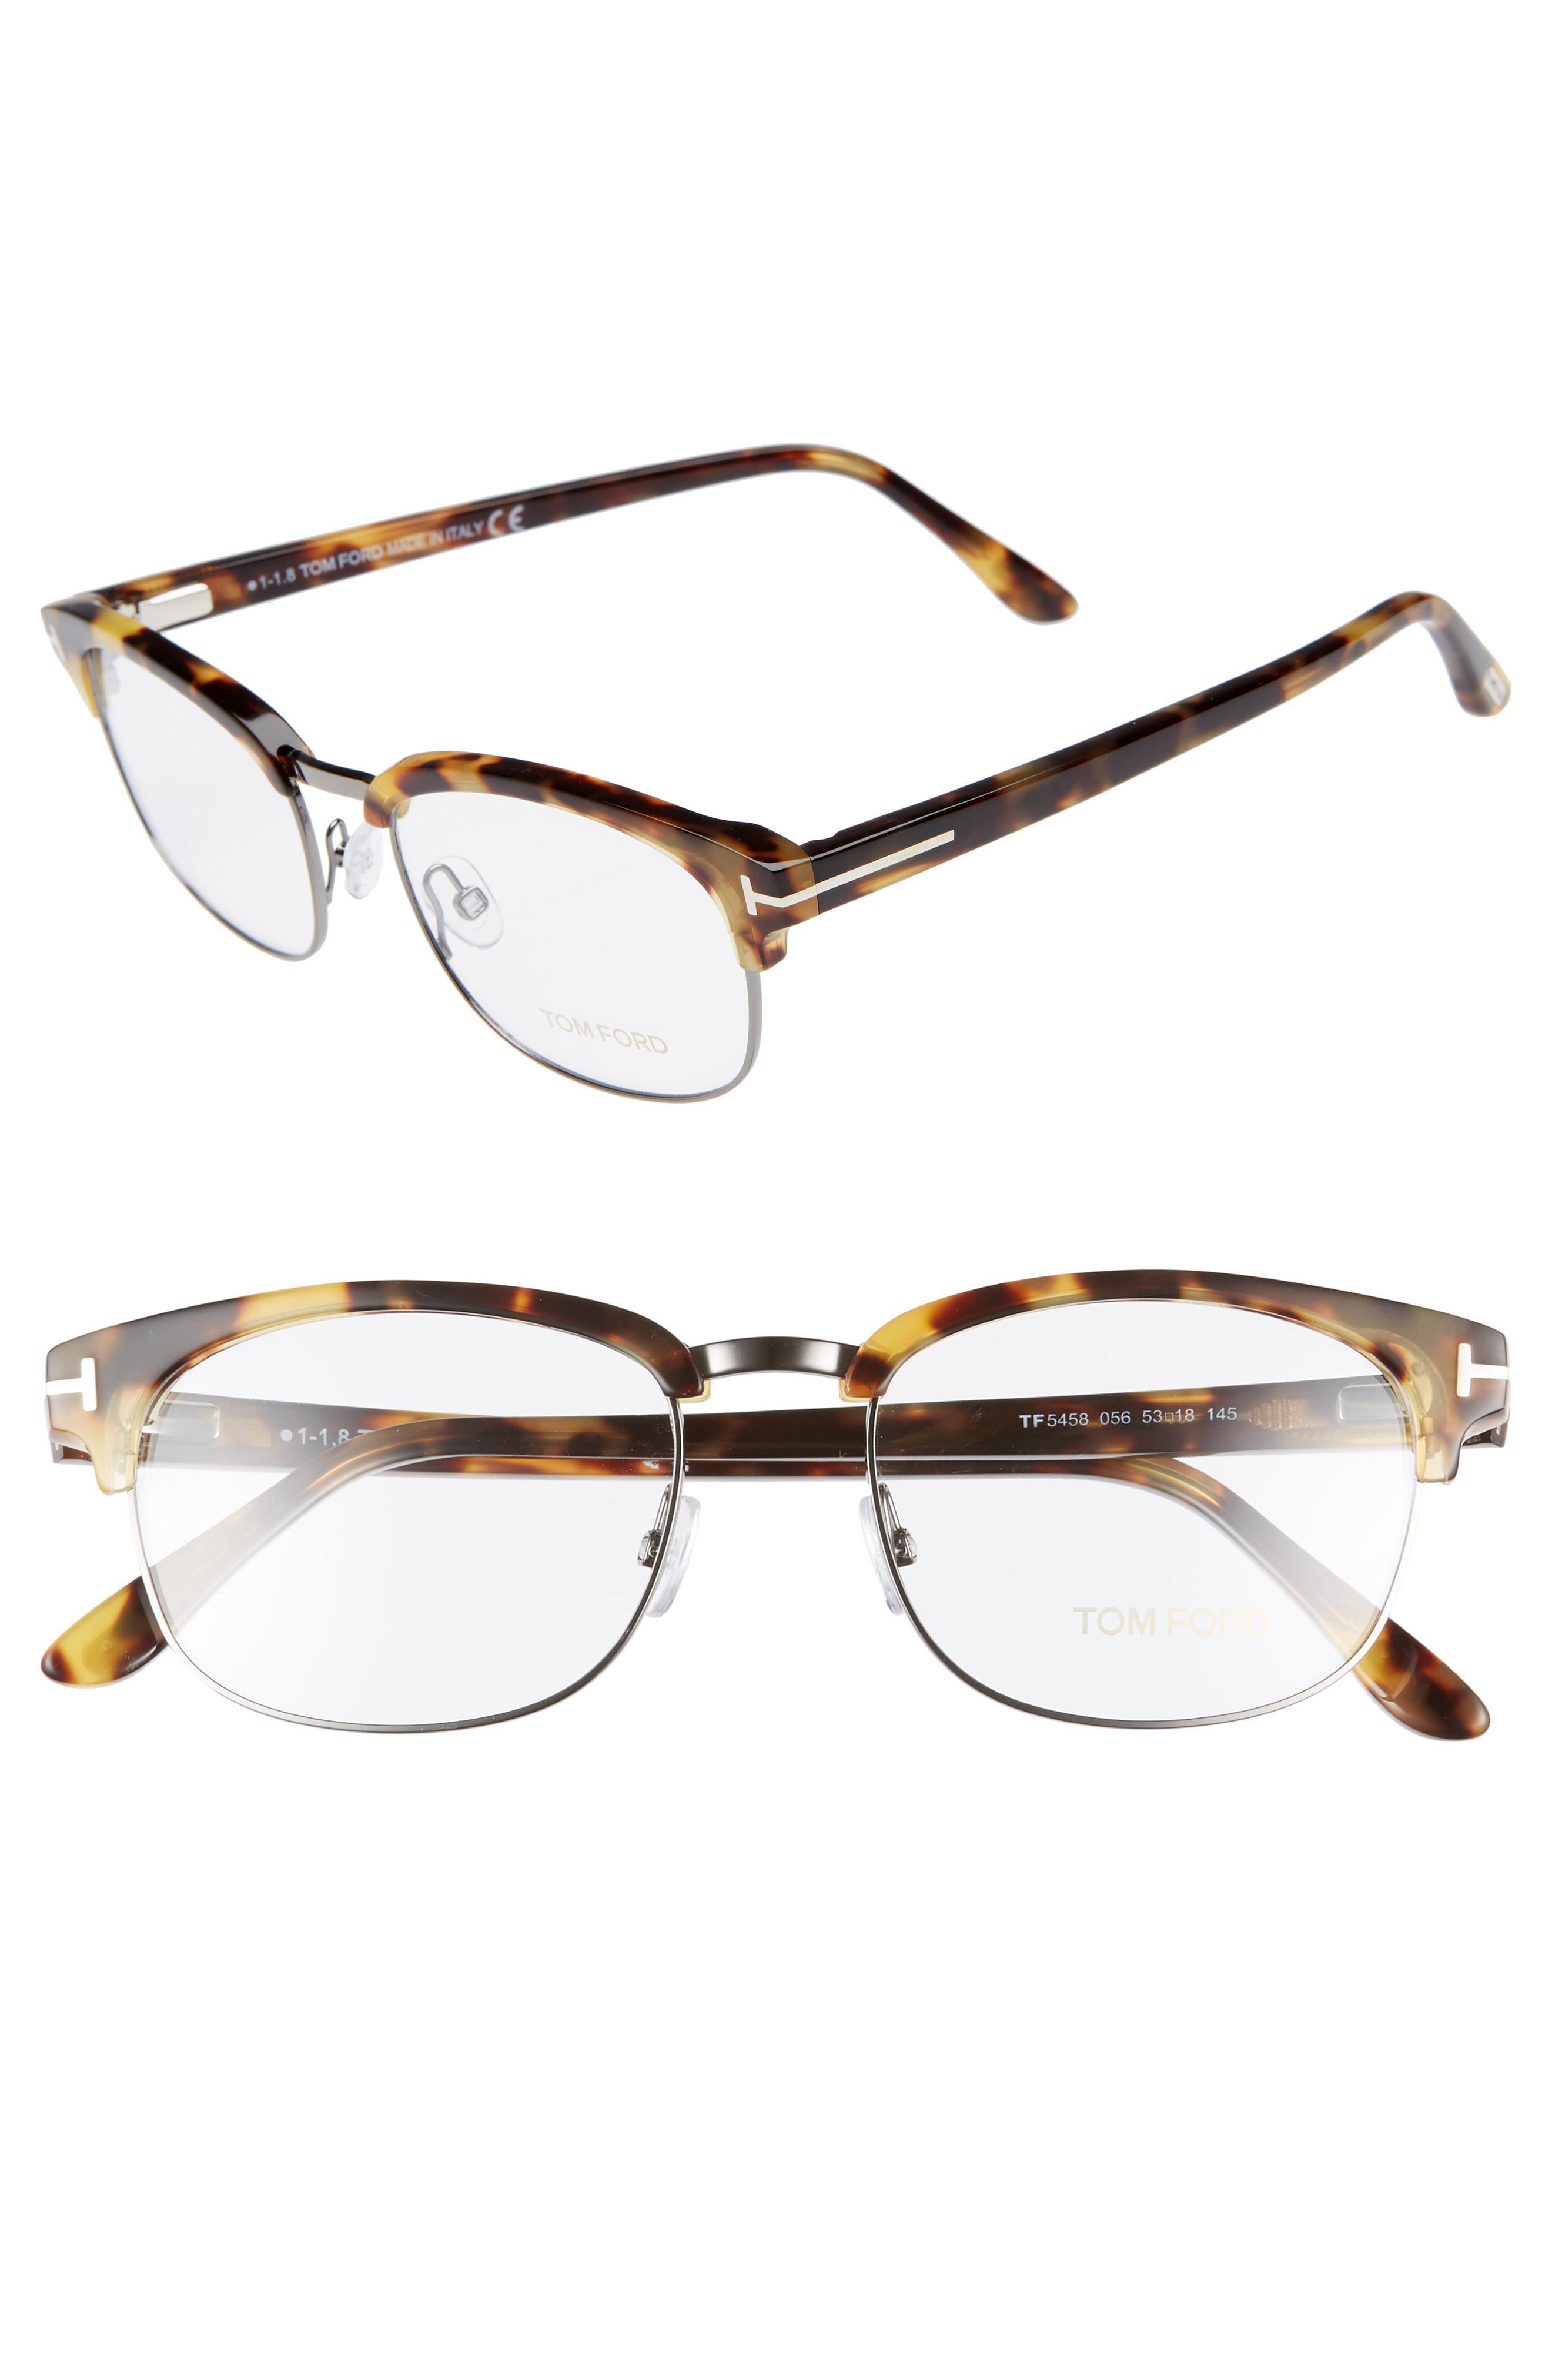 a1430ccccd9 Tom Ford - Multicolor 53mm Optical Glasses - Shiny Tortoise - Lyst. View  fullscreen